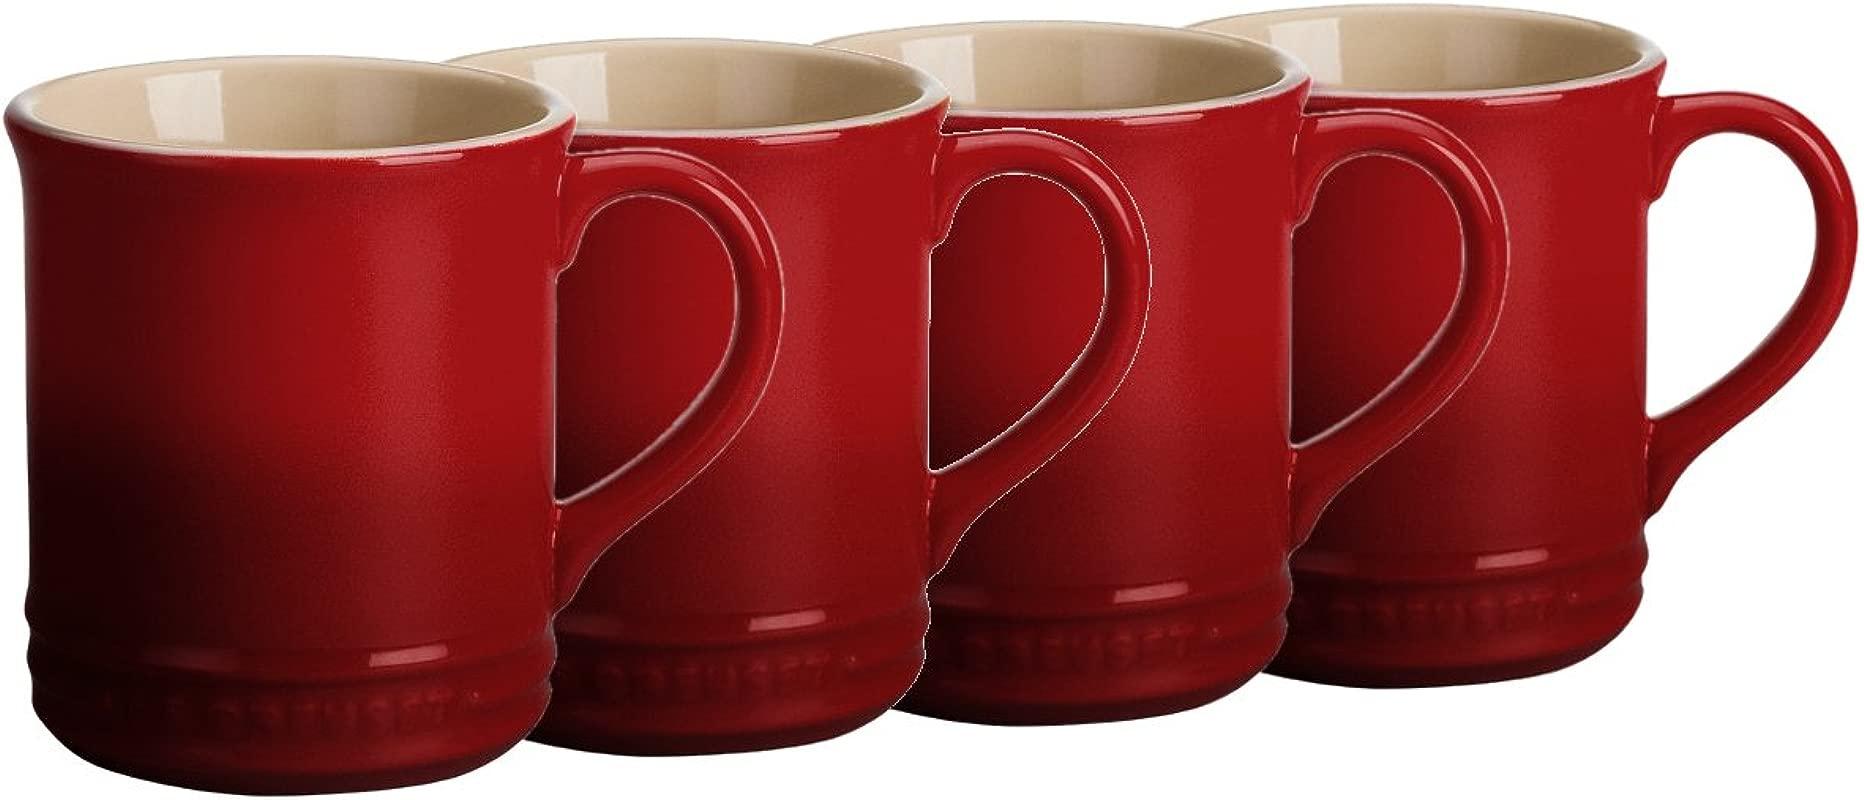 Le Creuset Cerise Cherry Stoneware 12 Ounce Coffee Mug Set Of 4